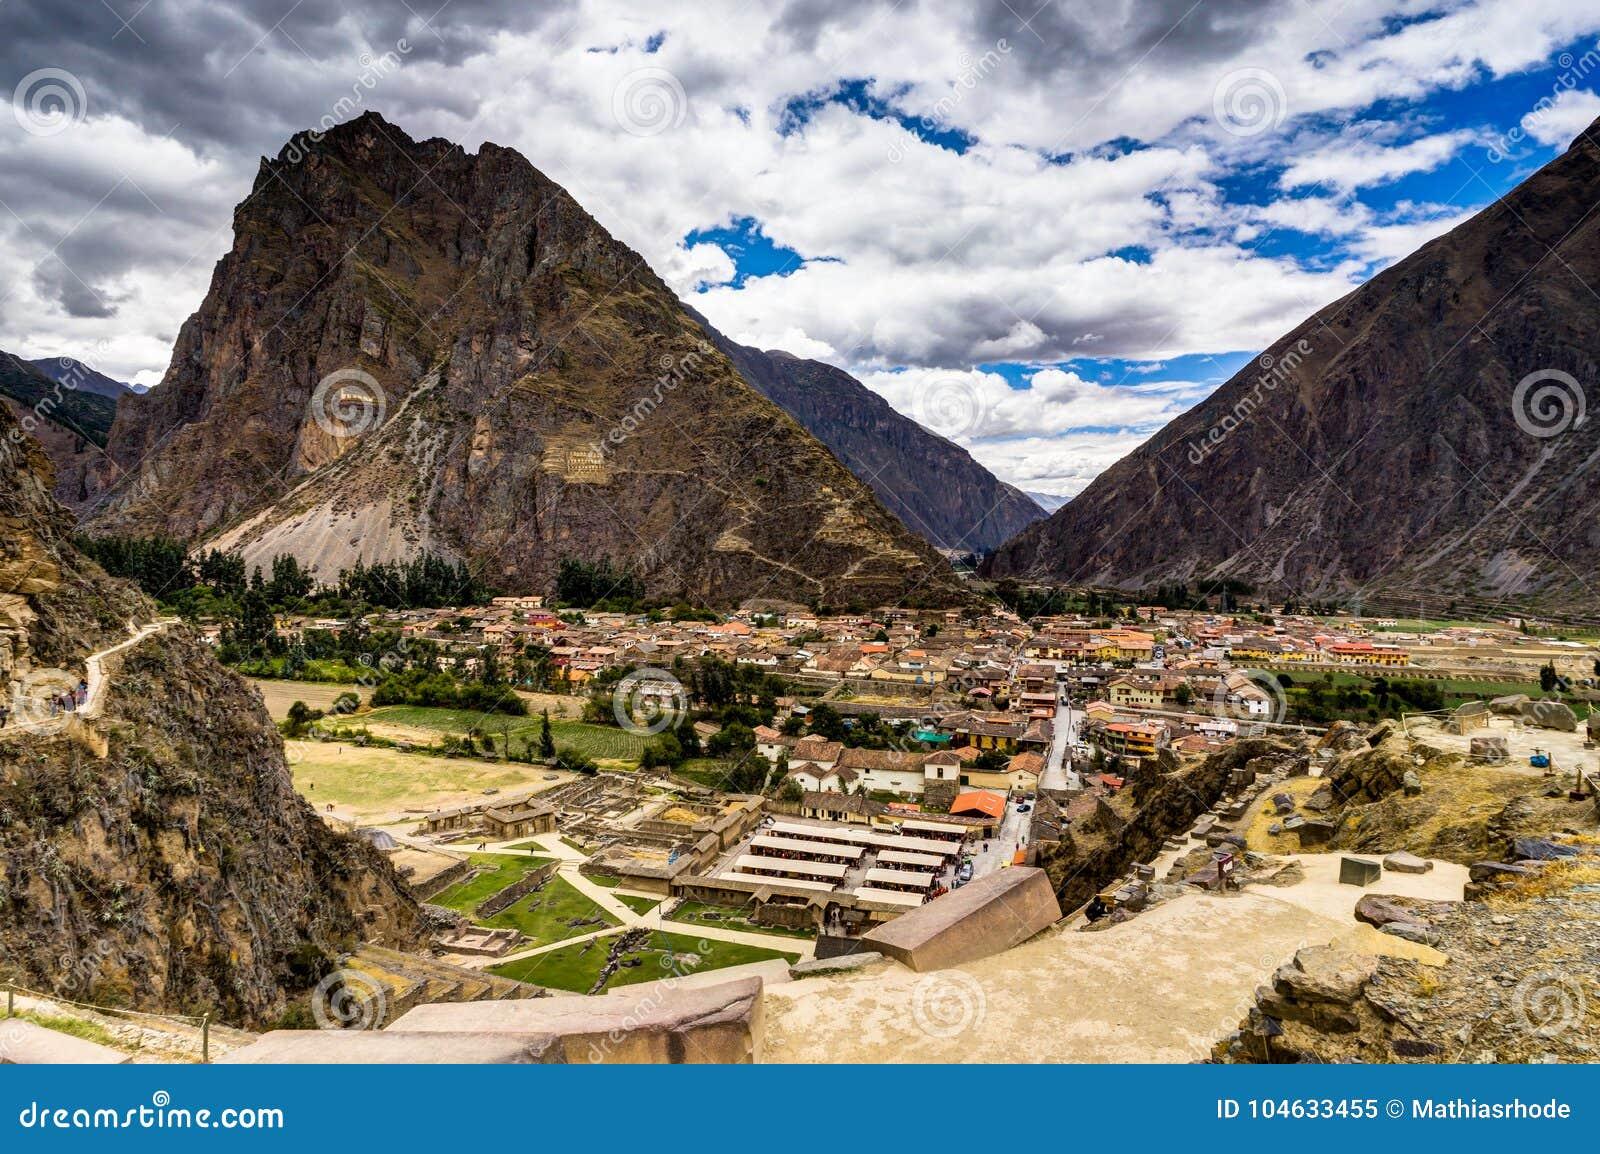 Download Mening Over Ollantaytambo Peru Met Blauwe Hemel En Wolken Stock Afbeelding - Afbeelding bestaande uit reis, vallei: 104633455